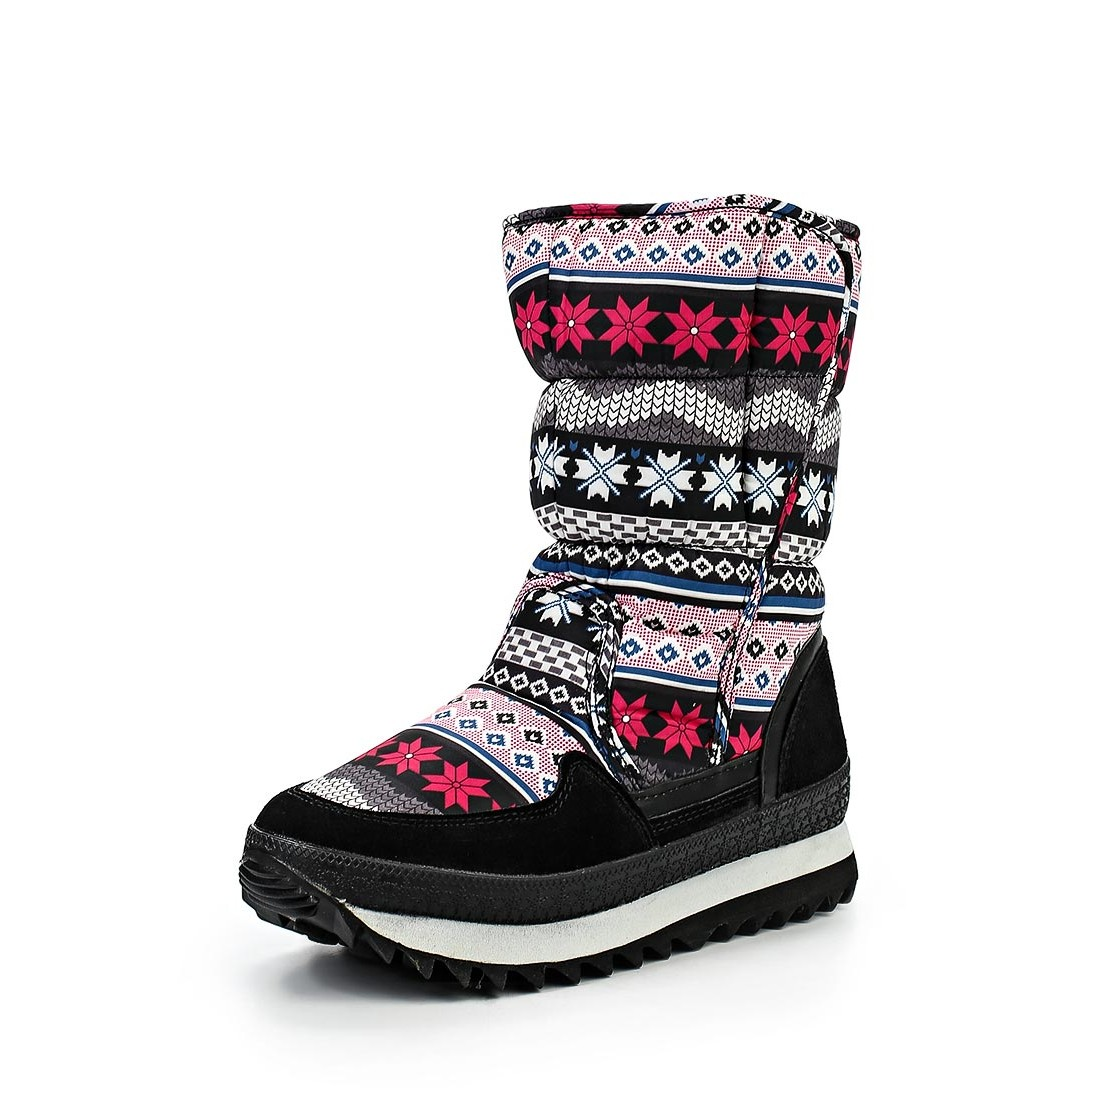 novinki-modnoj-zimnej-zhenskoj-obuvi-14